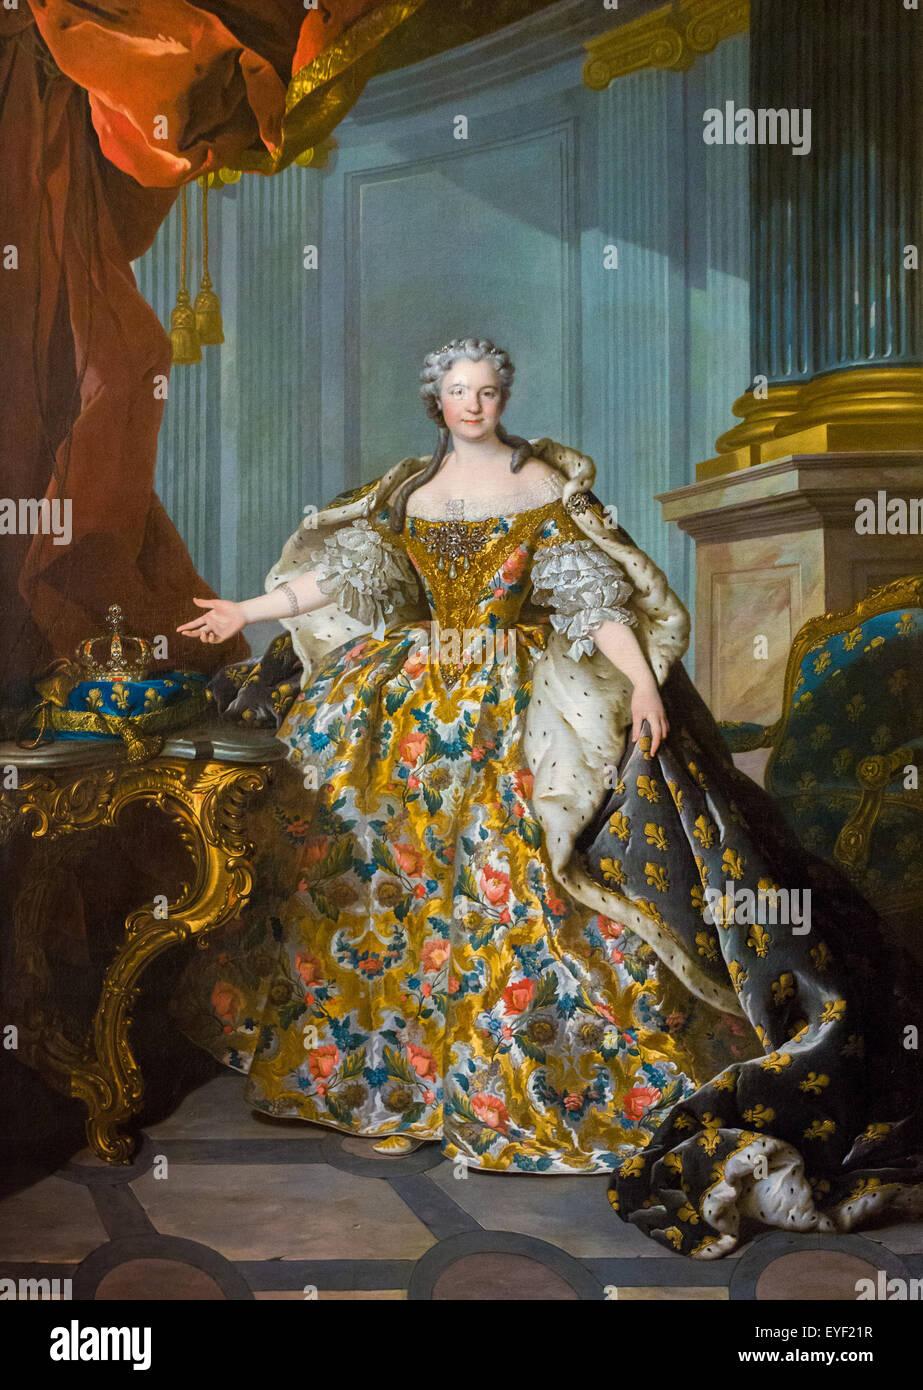 Marie Leczinska 12.10.2013 - Sammlung des 18. Jahrhunderts Stockbild